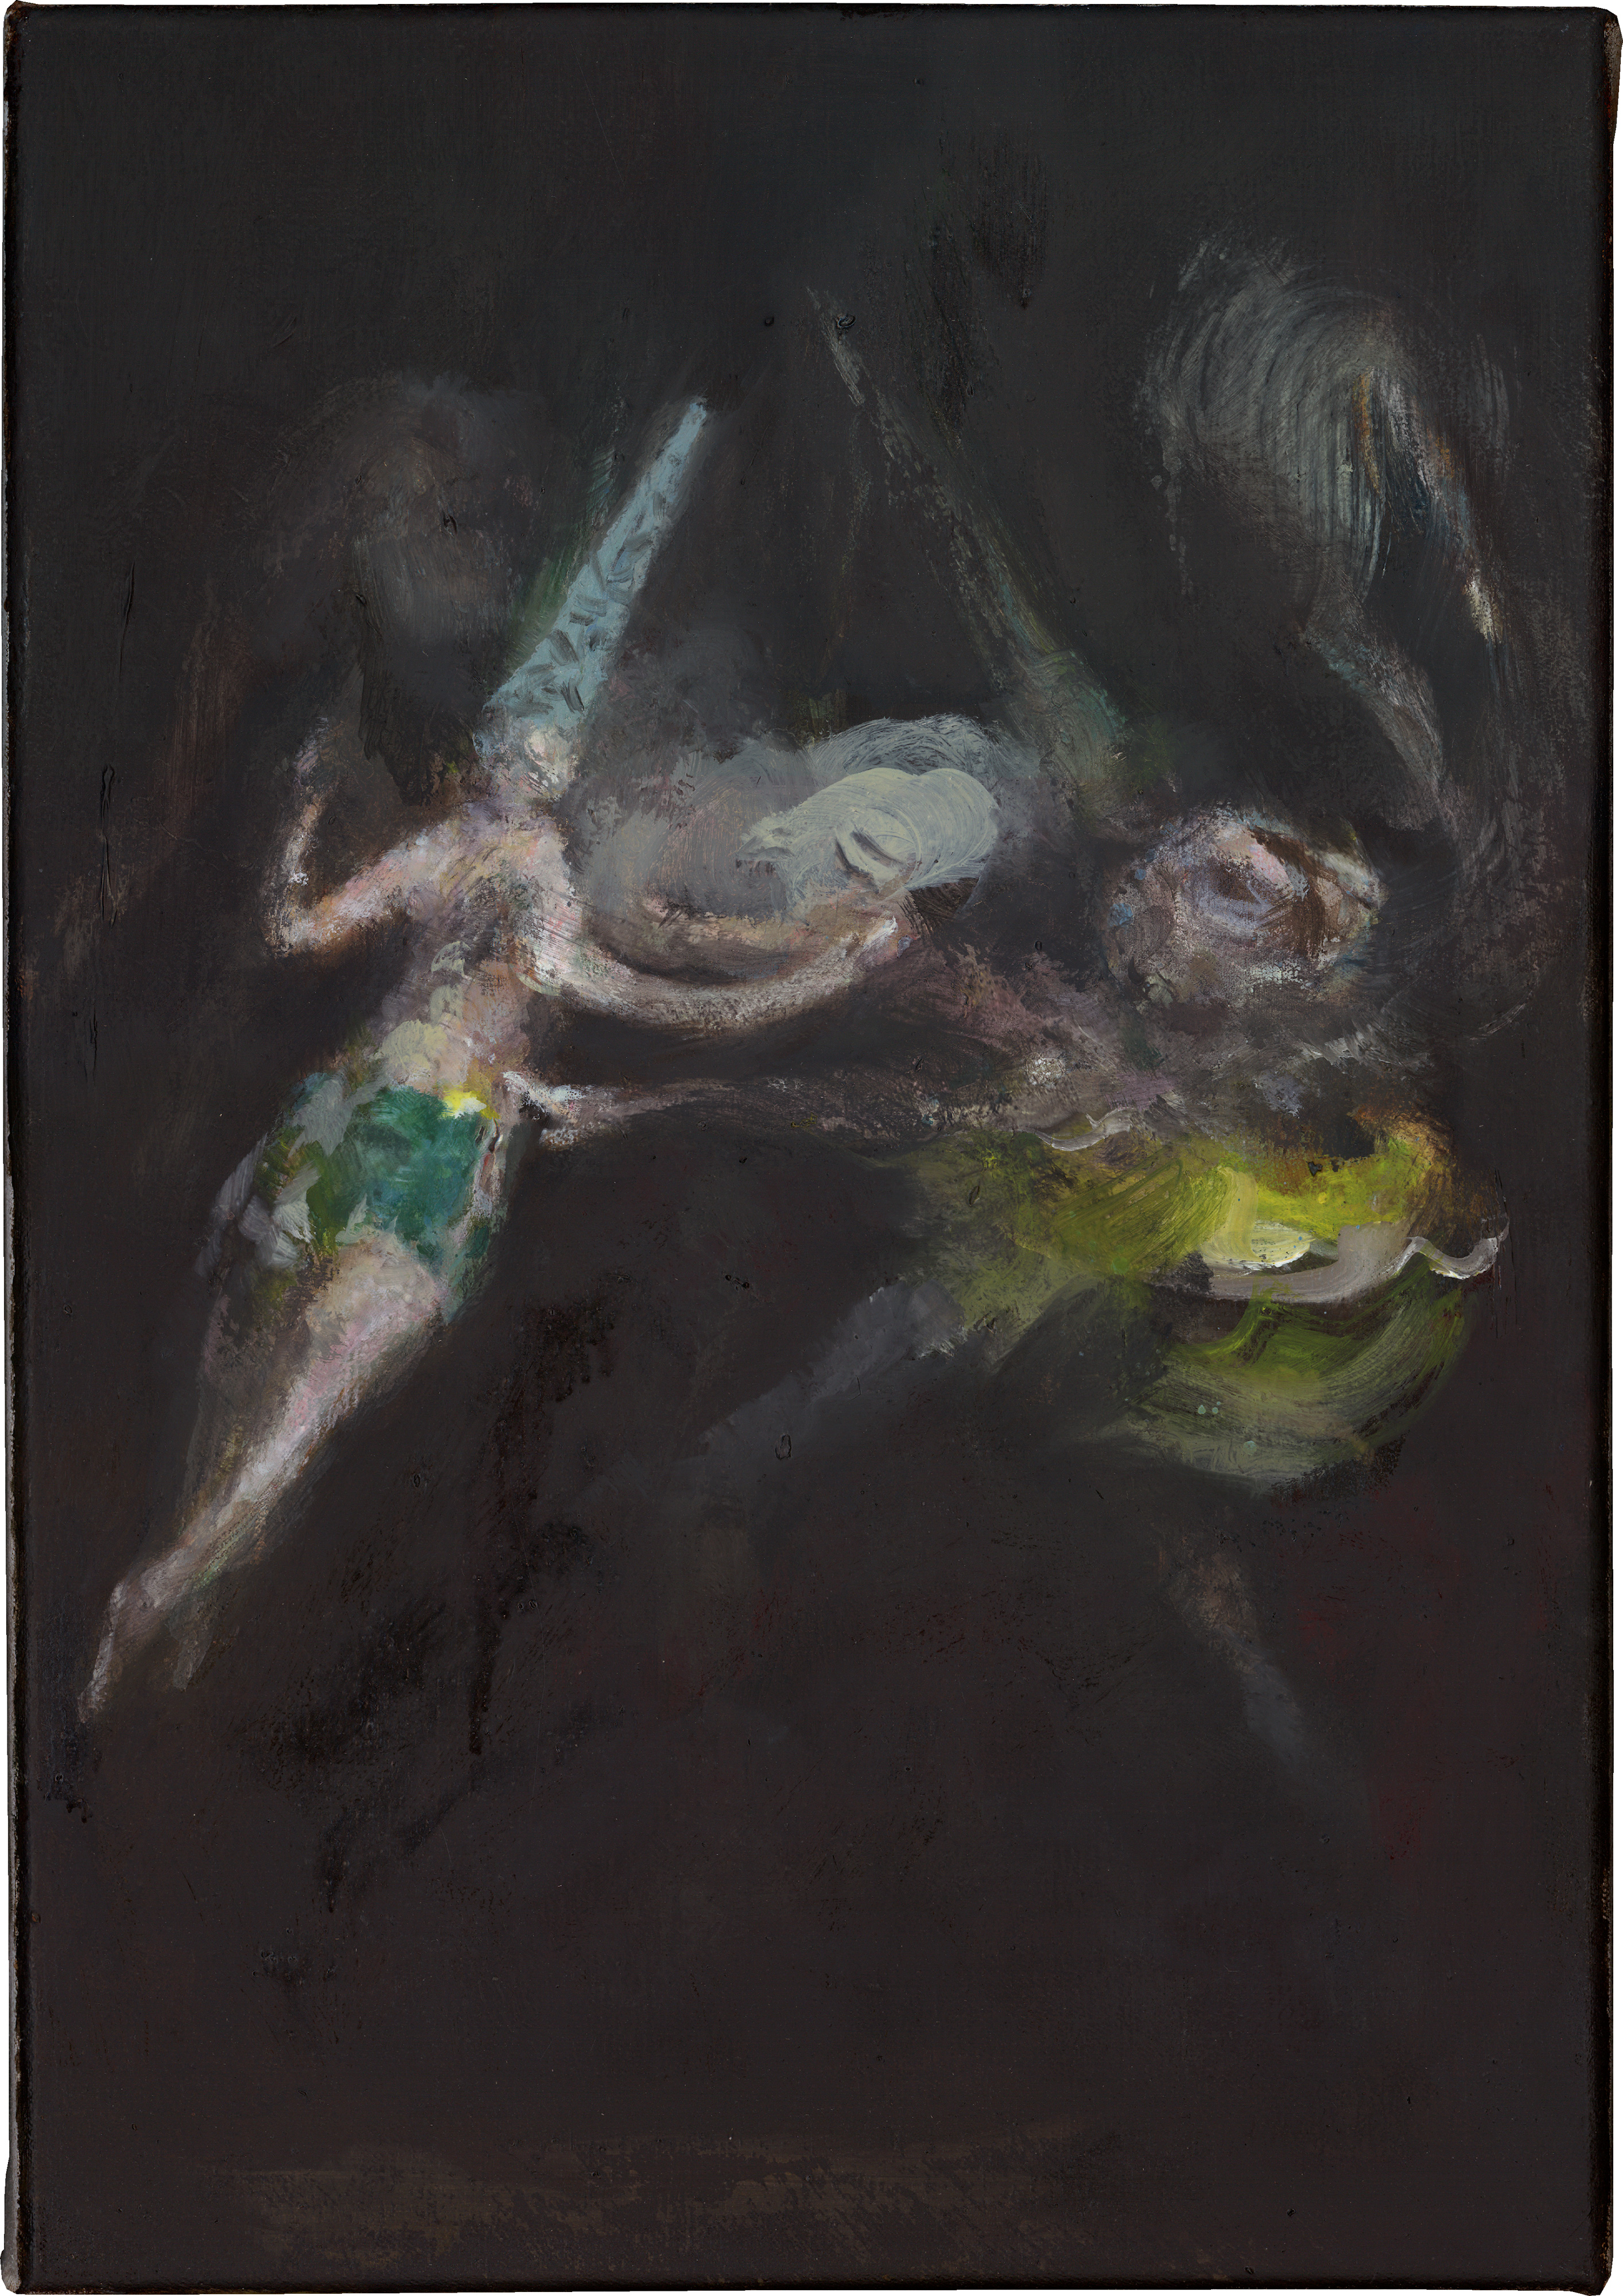 Galerie Barbara Thumm \ Valérie Favre: Ghost (nach Goyas Flug der Hexen) (VFa-14-009) \ Ghost (nach Goyas Flug der Hexen) (2014 – 2016)